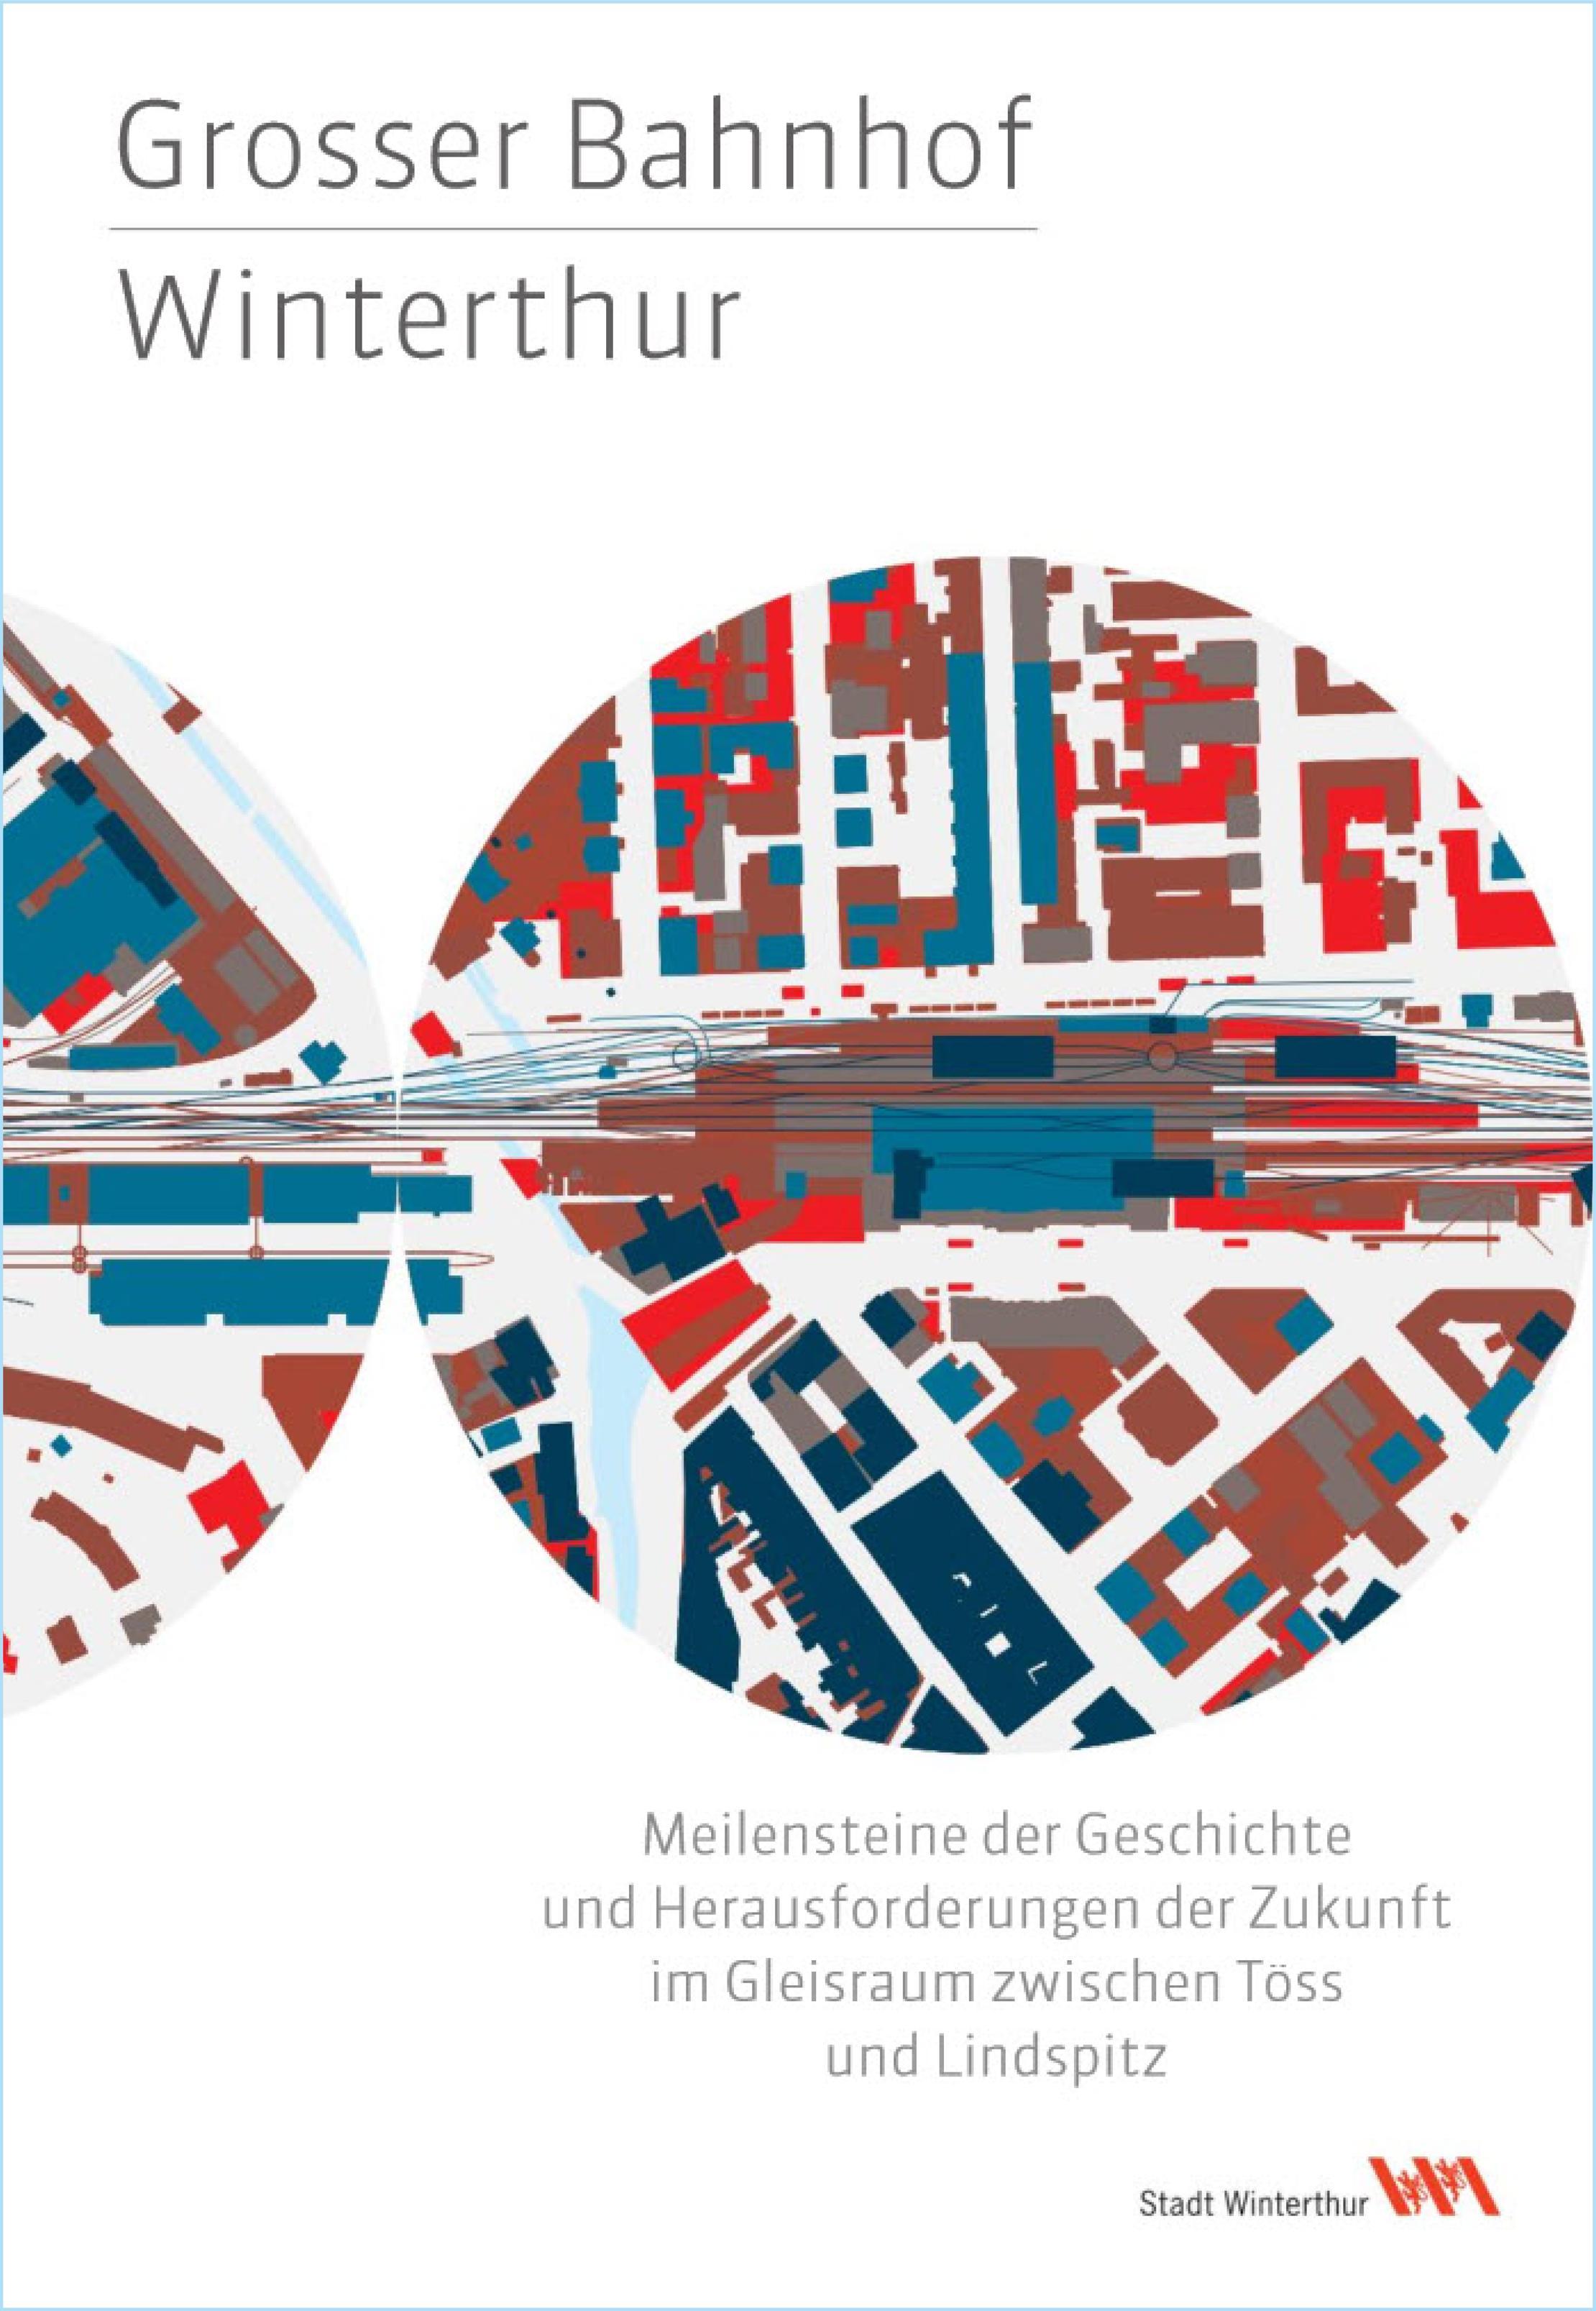 """Grosser Bahnhof"" by David Streiff, Dallenwil 2018, call number: DW 23405"